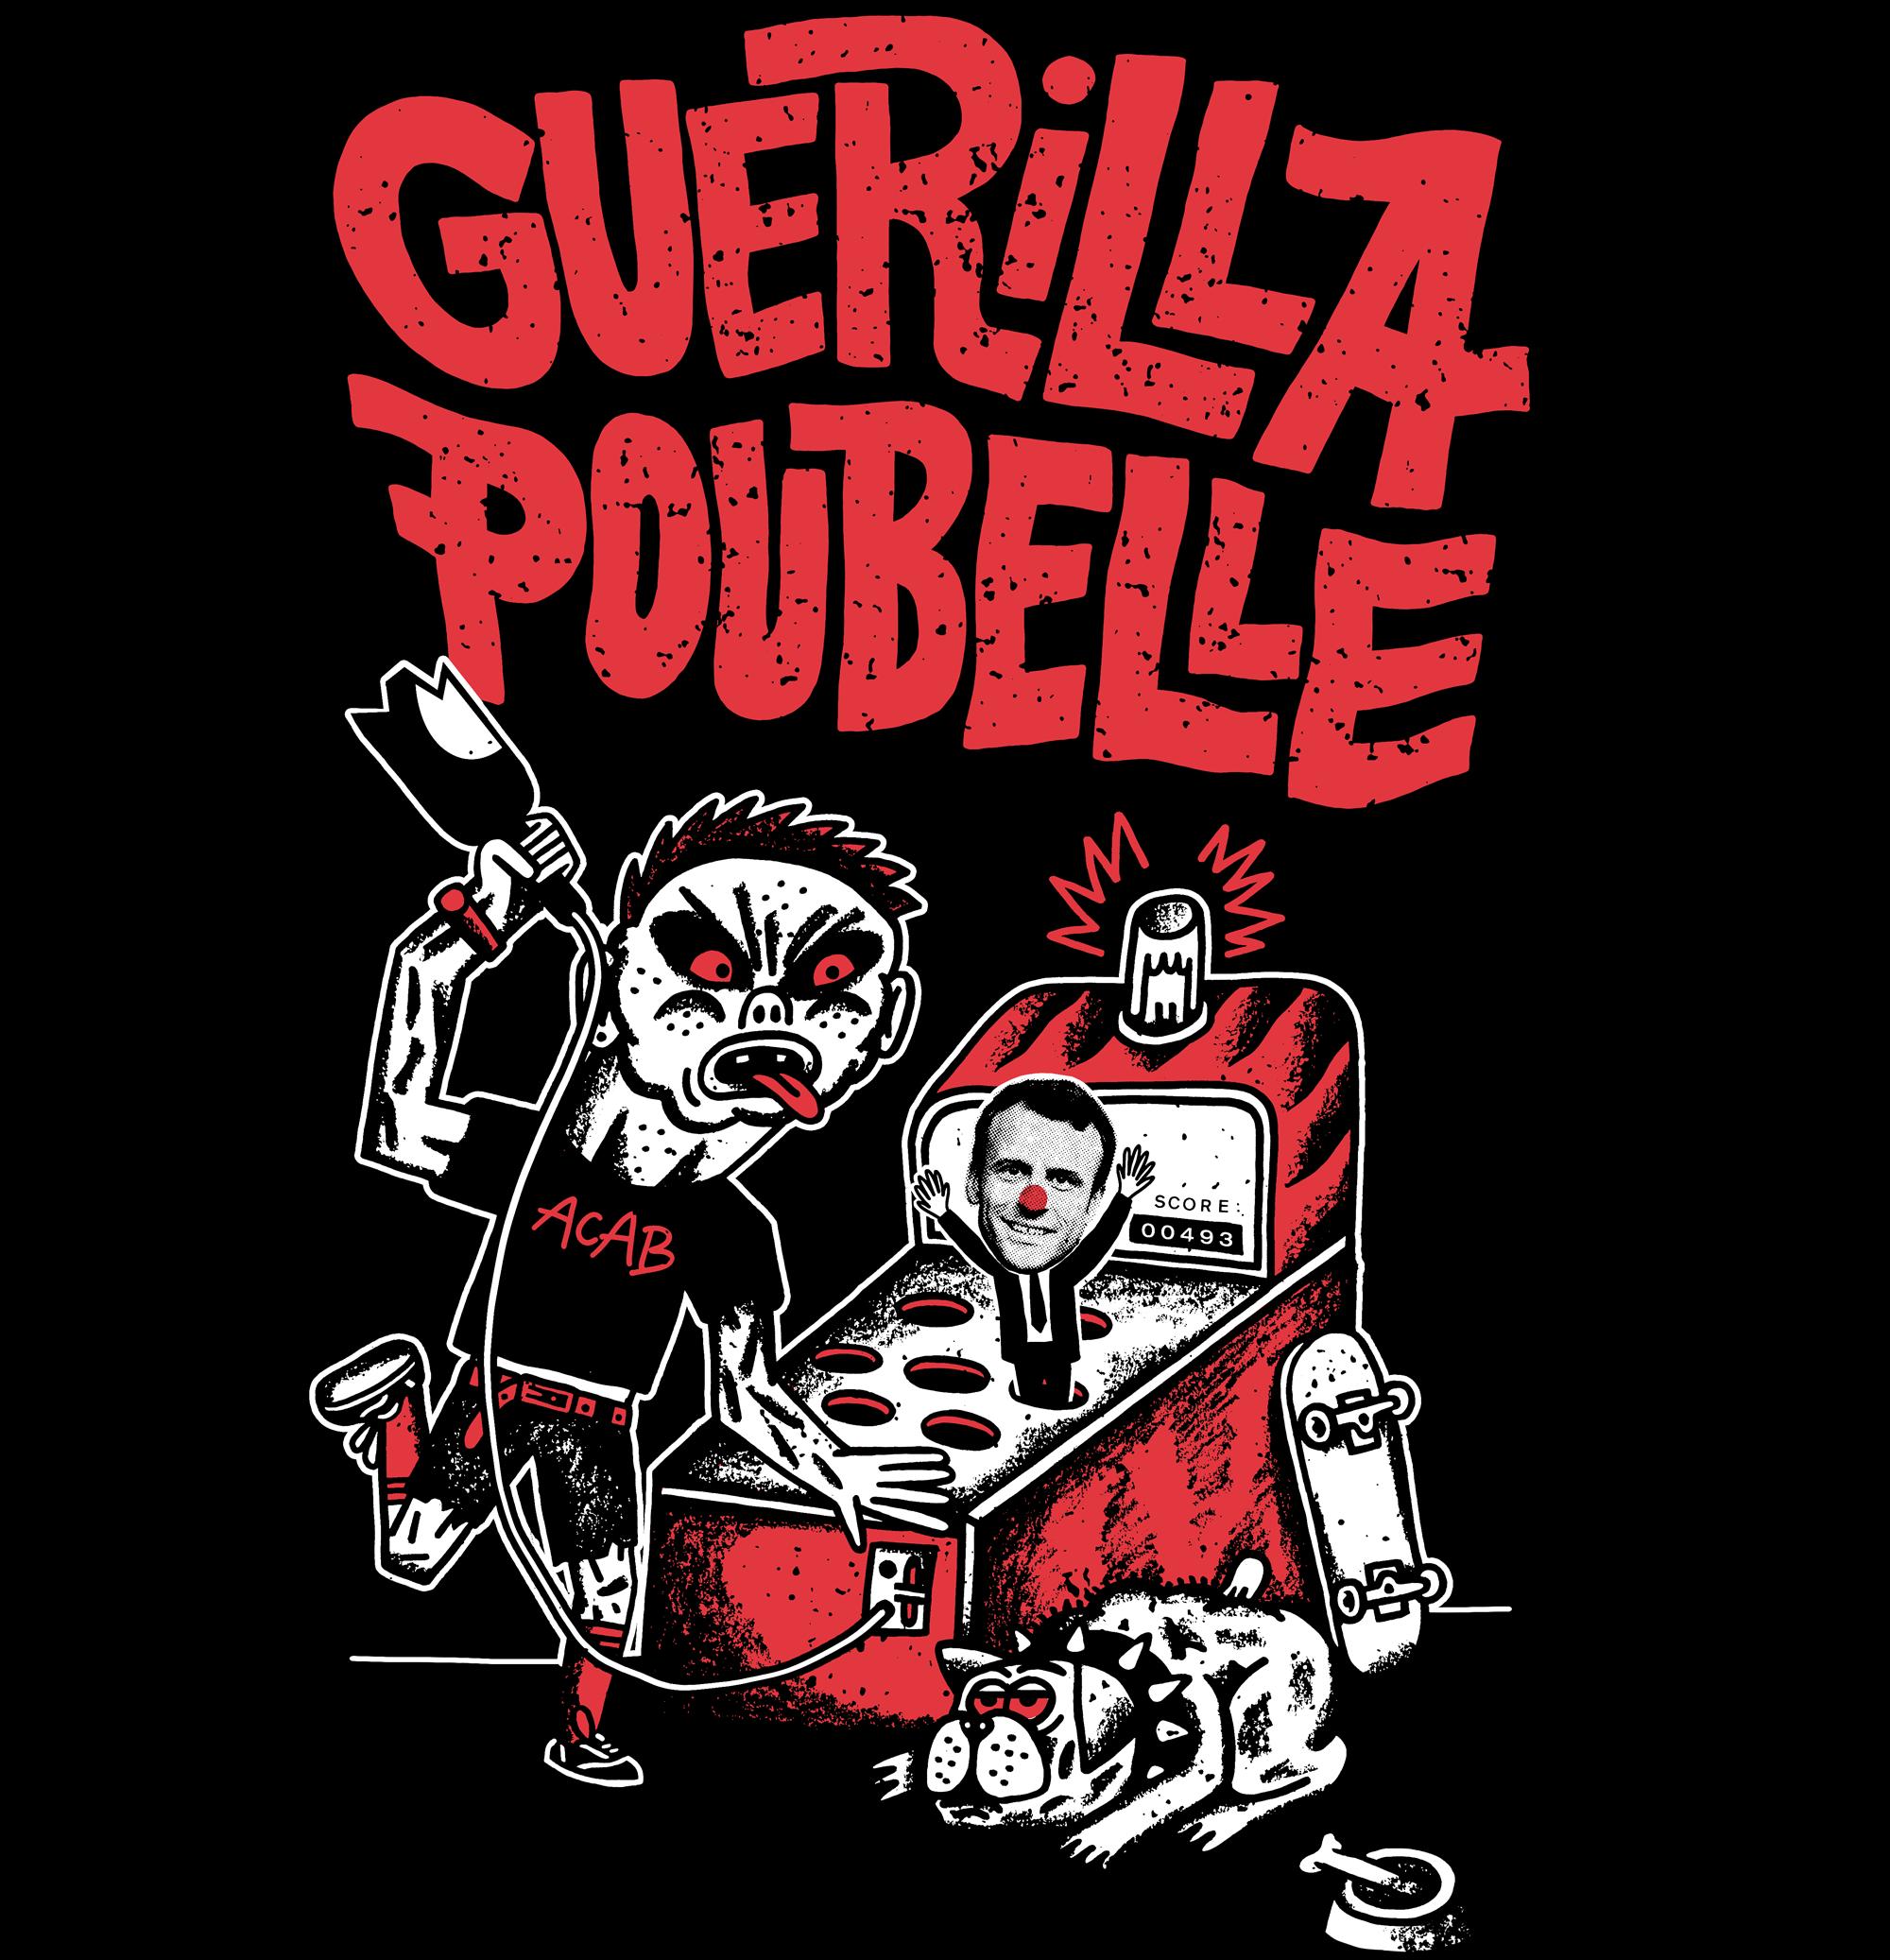 Guerilla Poubelle - TS Whack A Macron